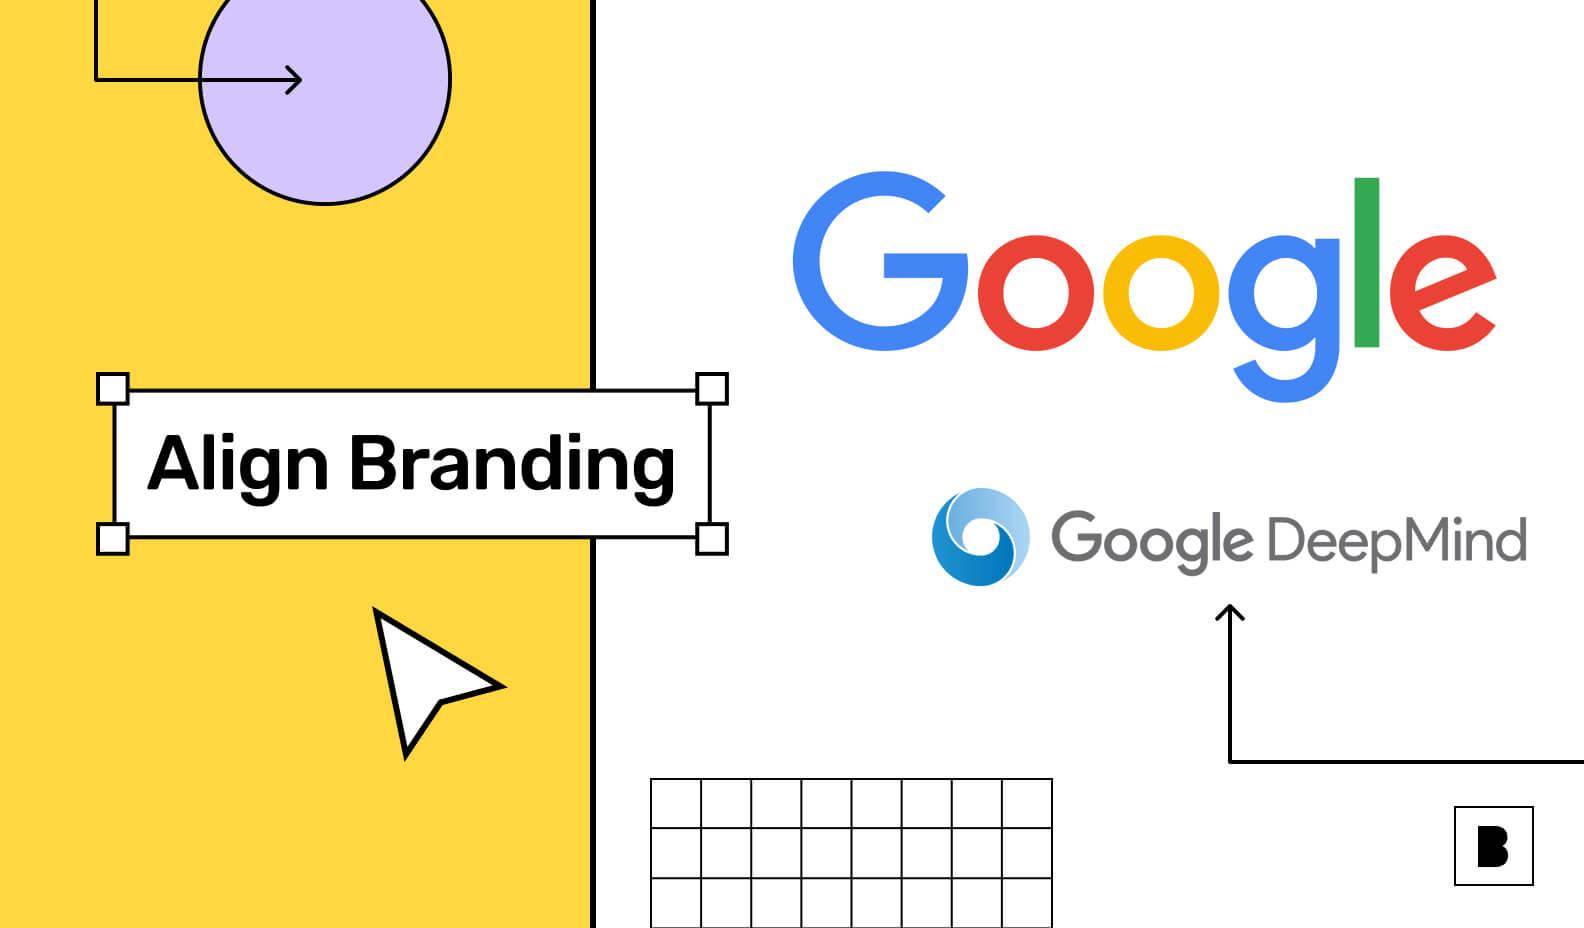 Align branding across products